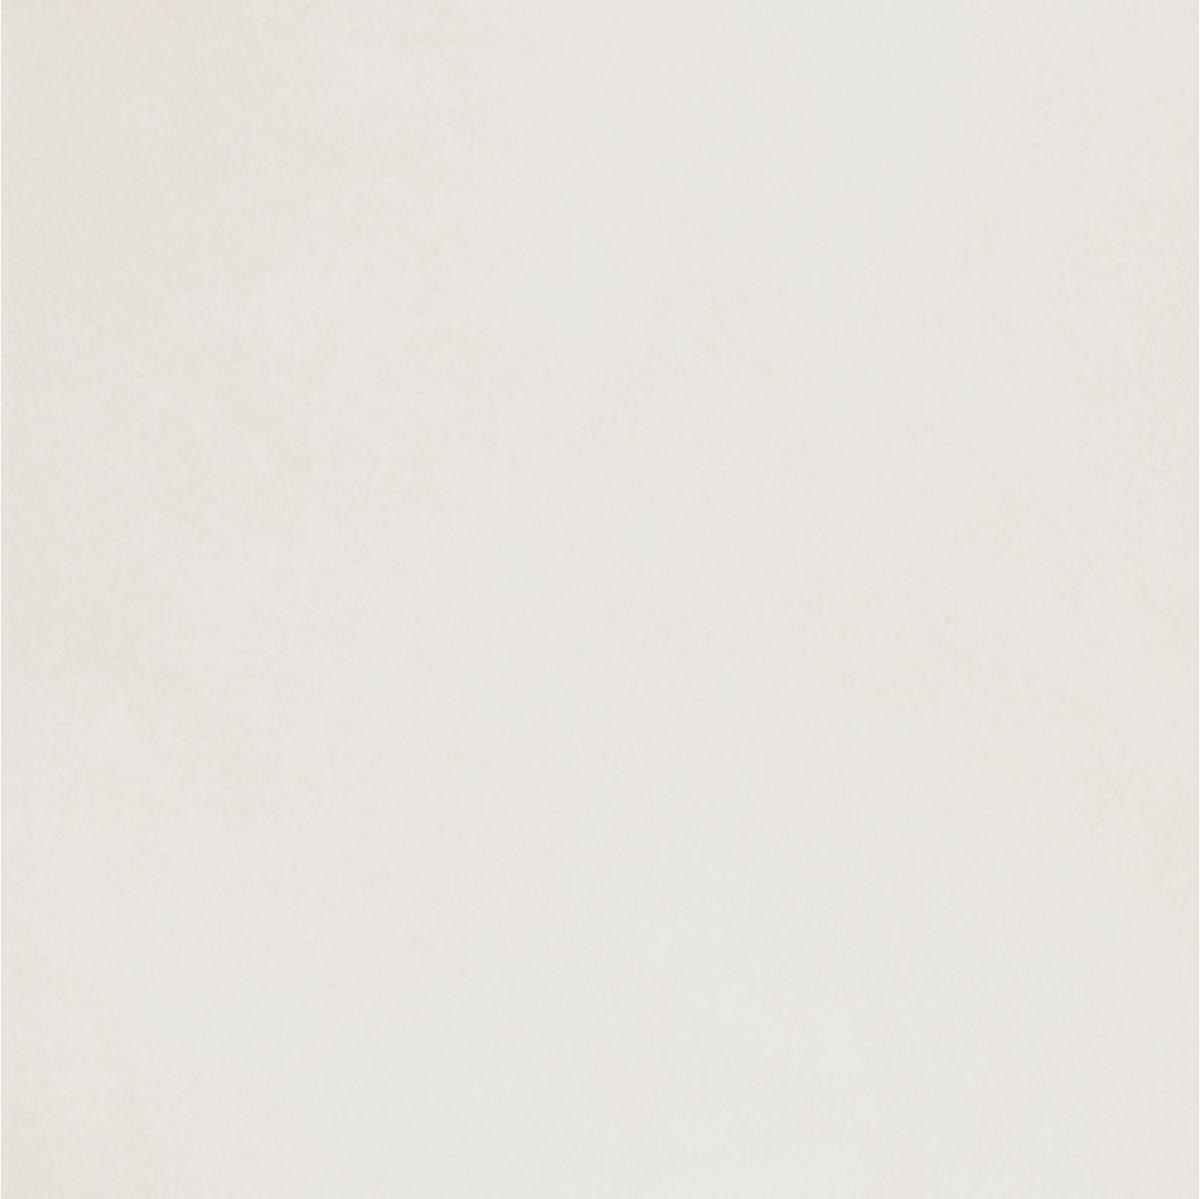 60x60 cm ziro blanco